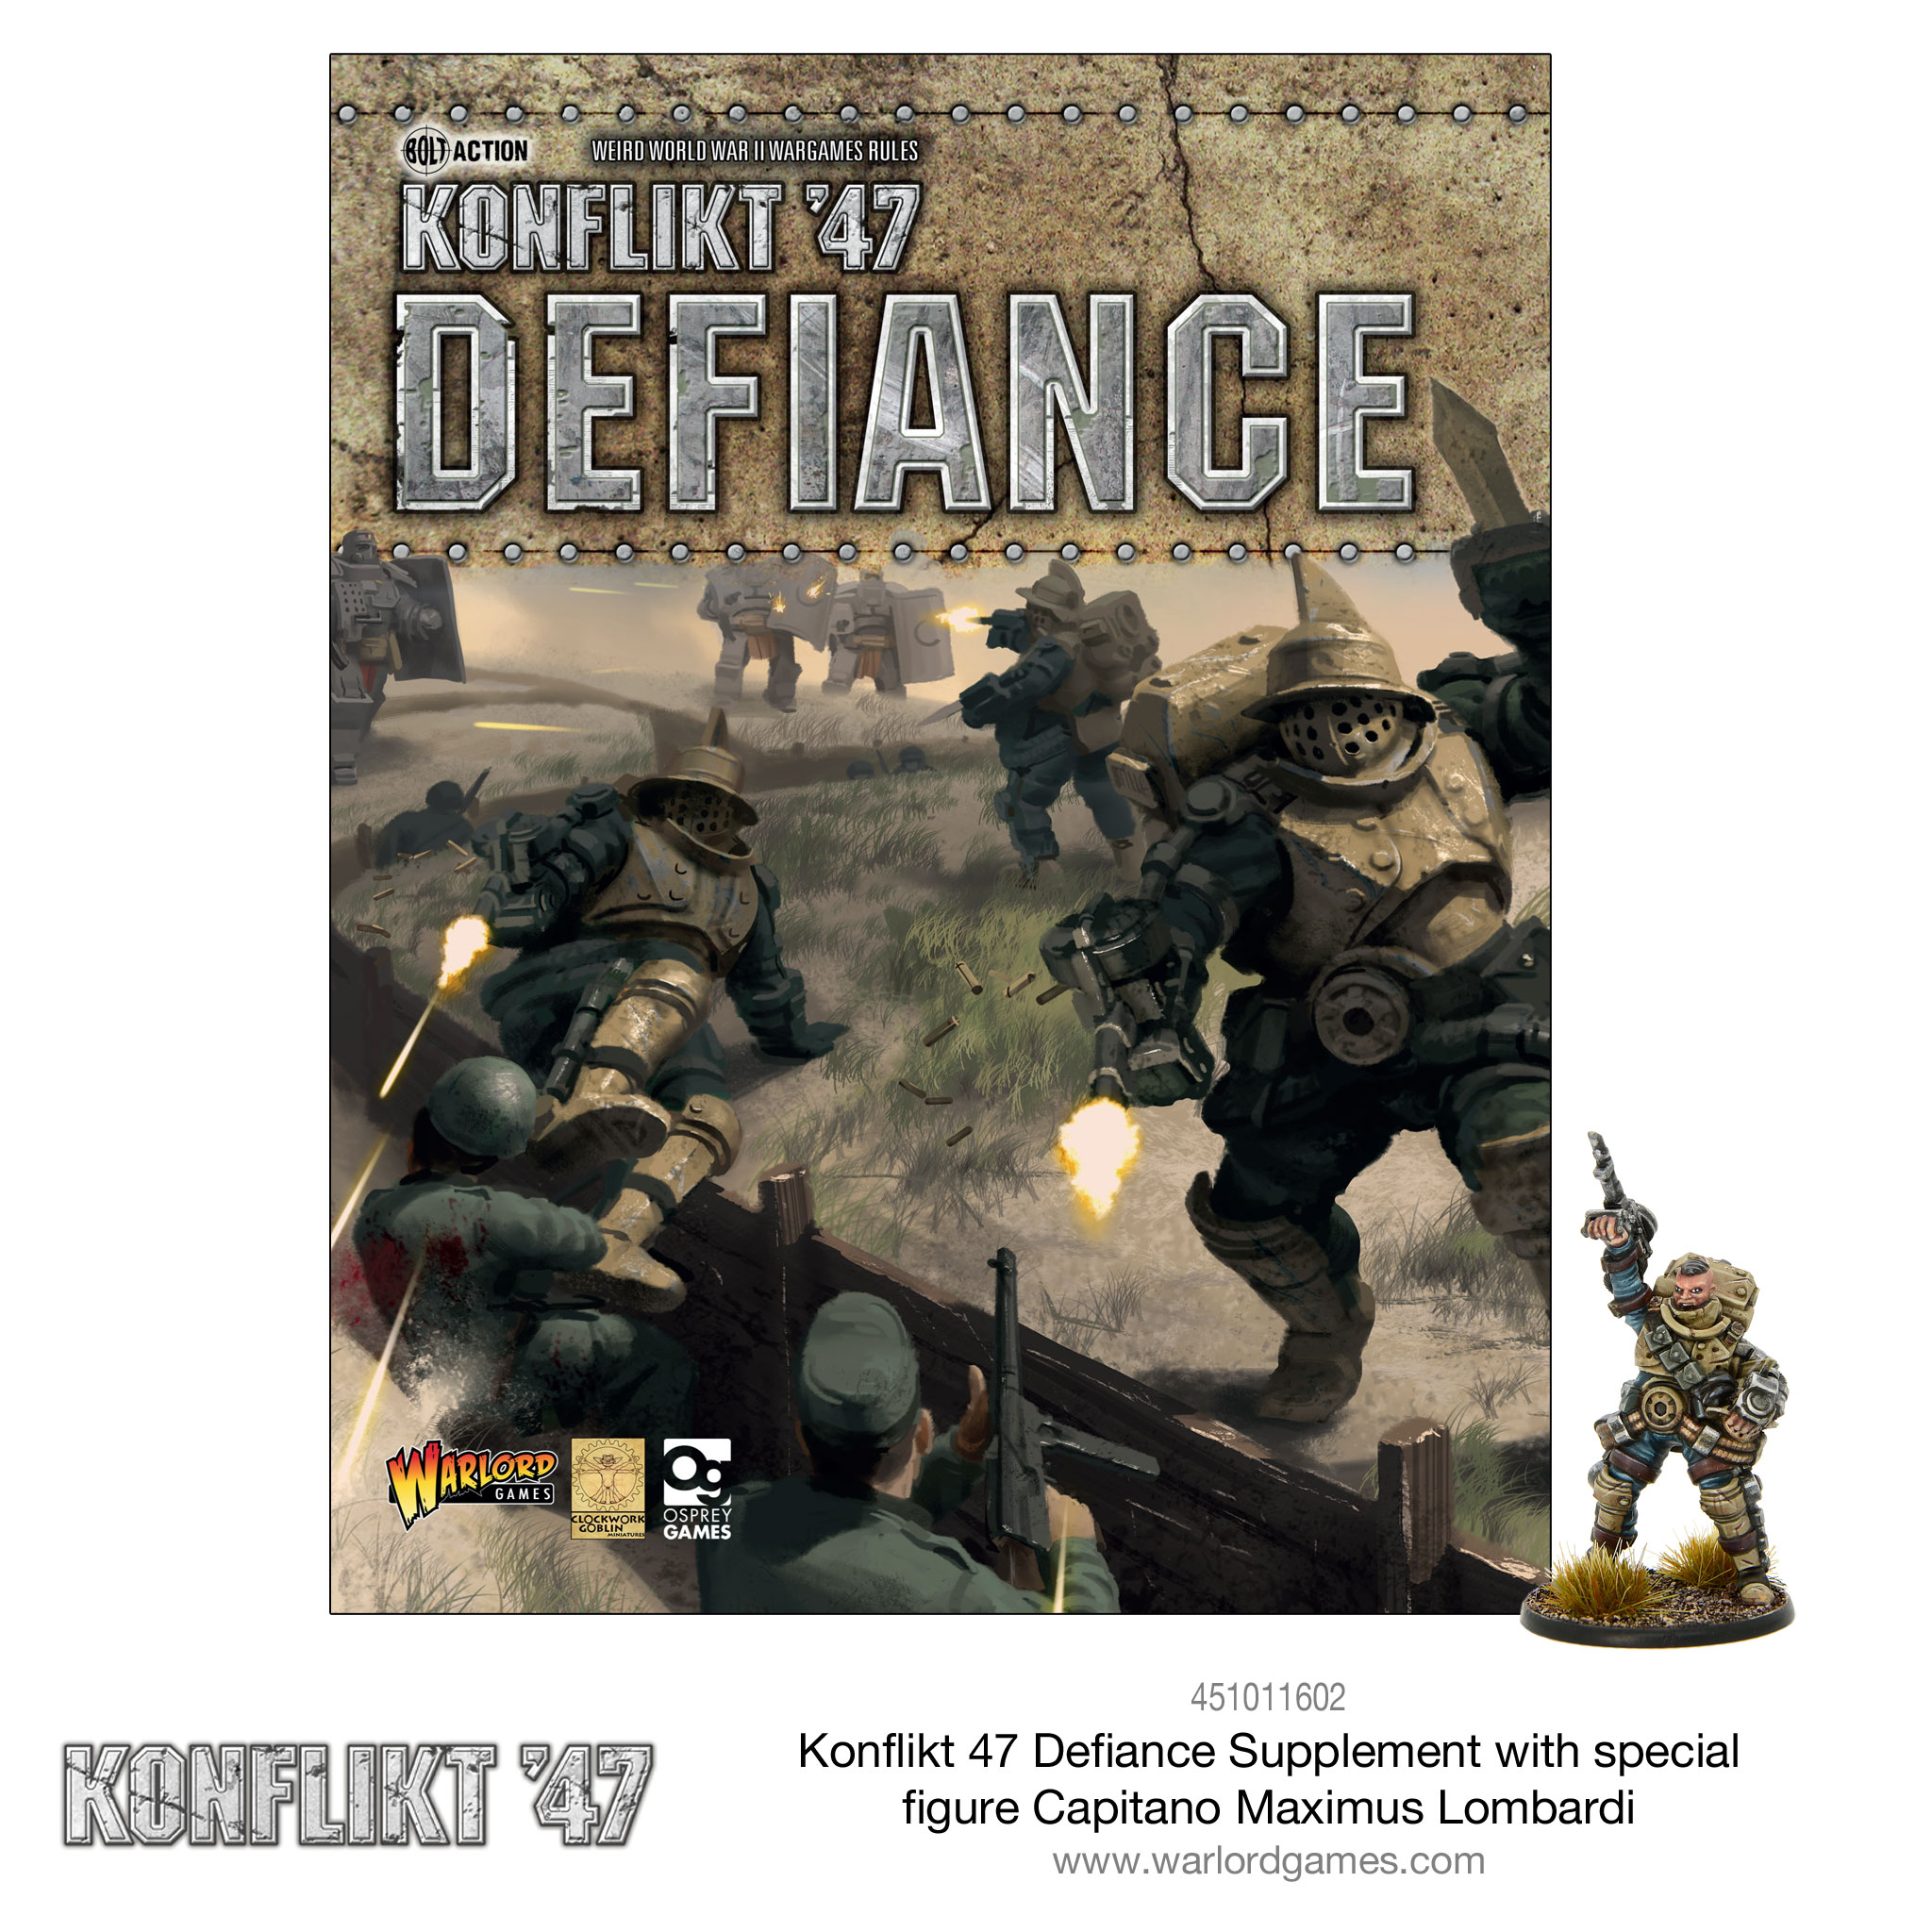 New Konflikt '47 Defiance Supplement